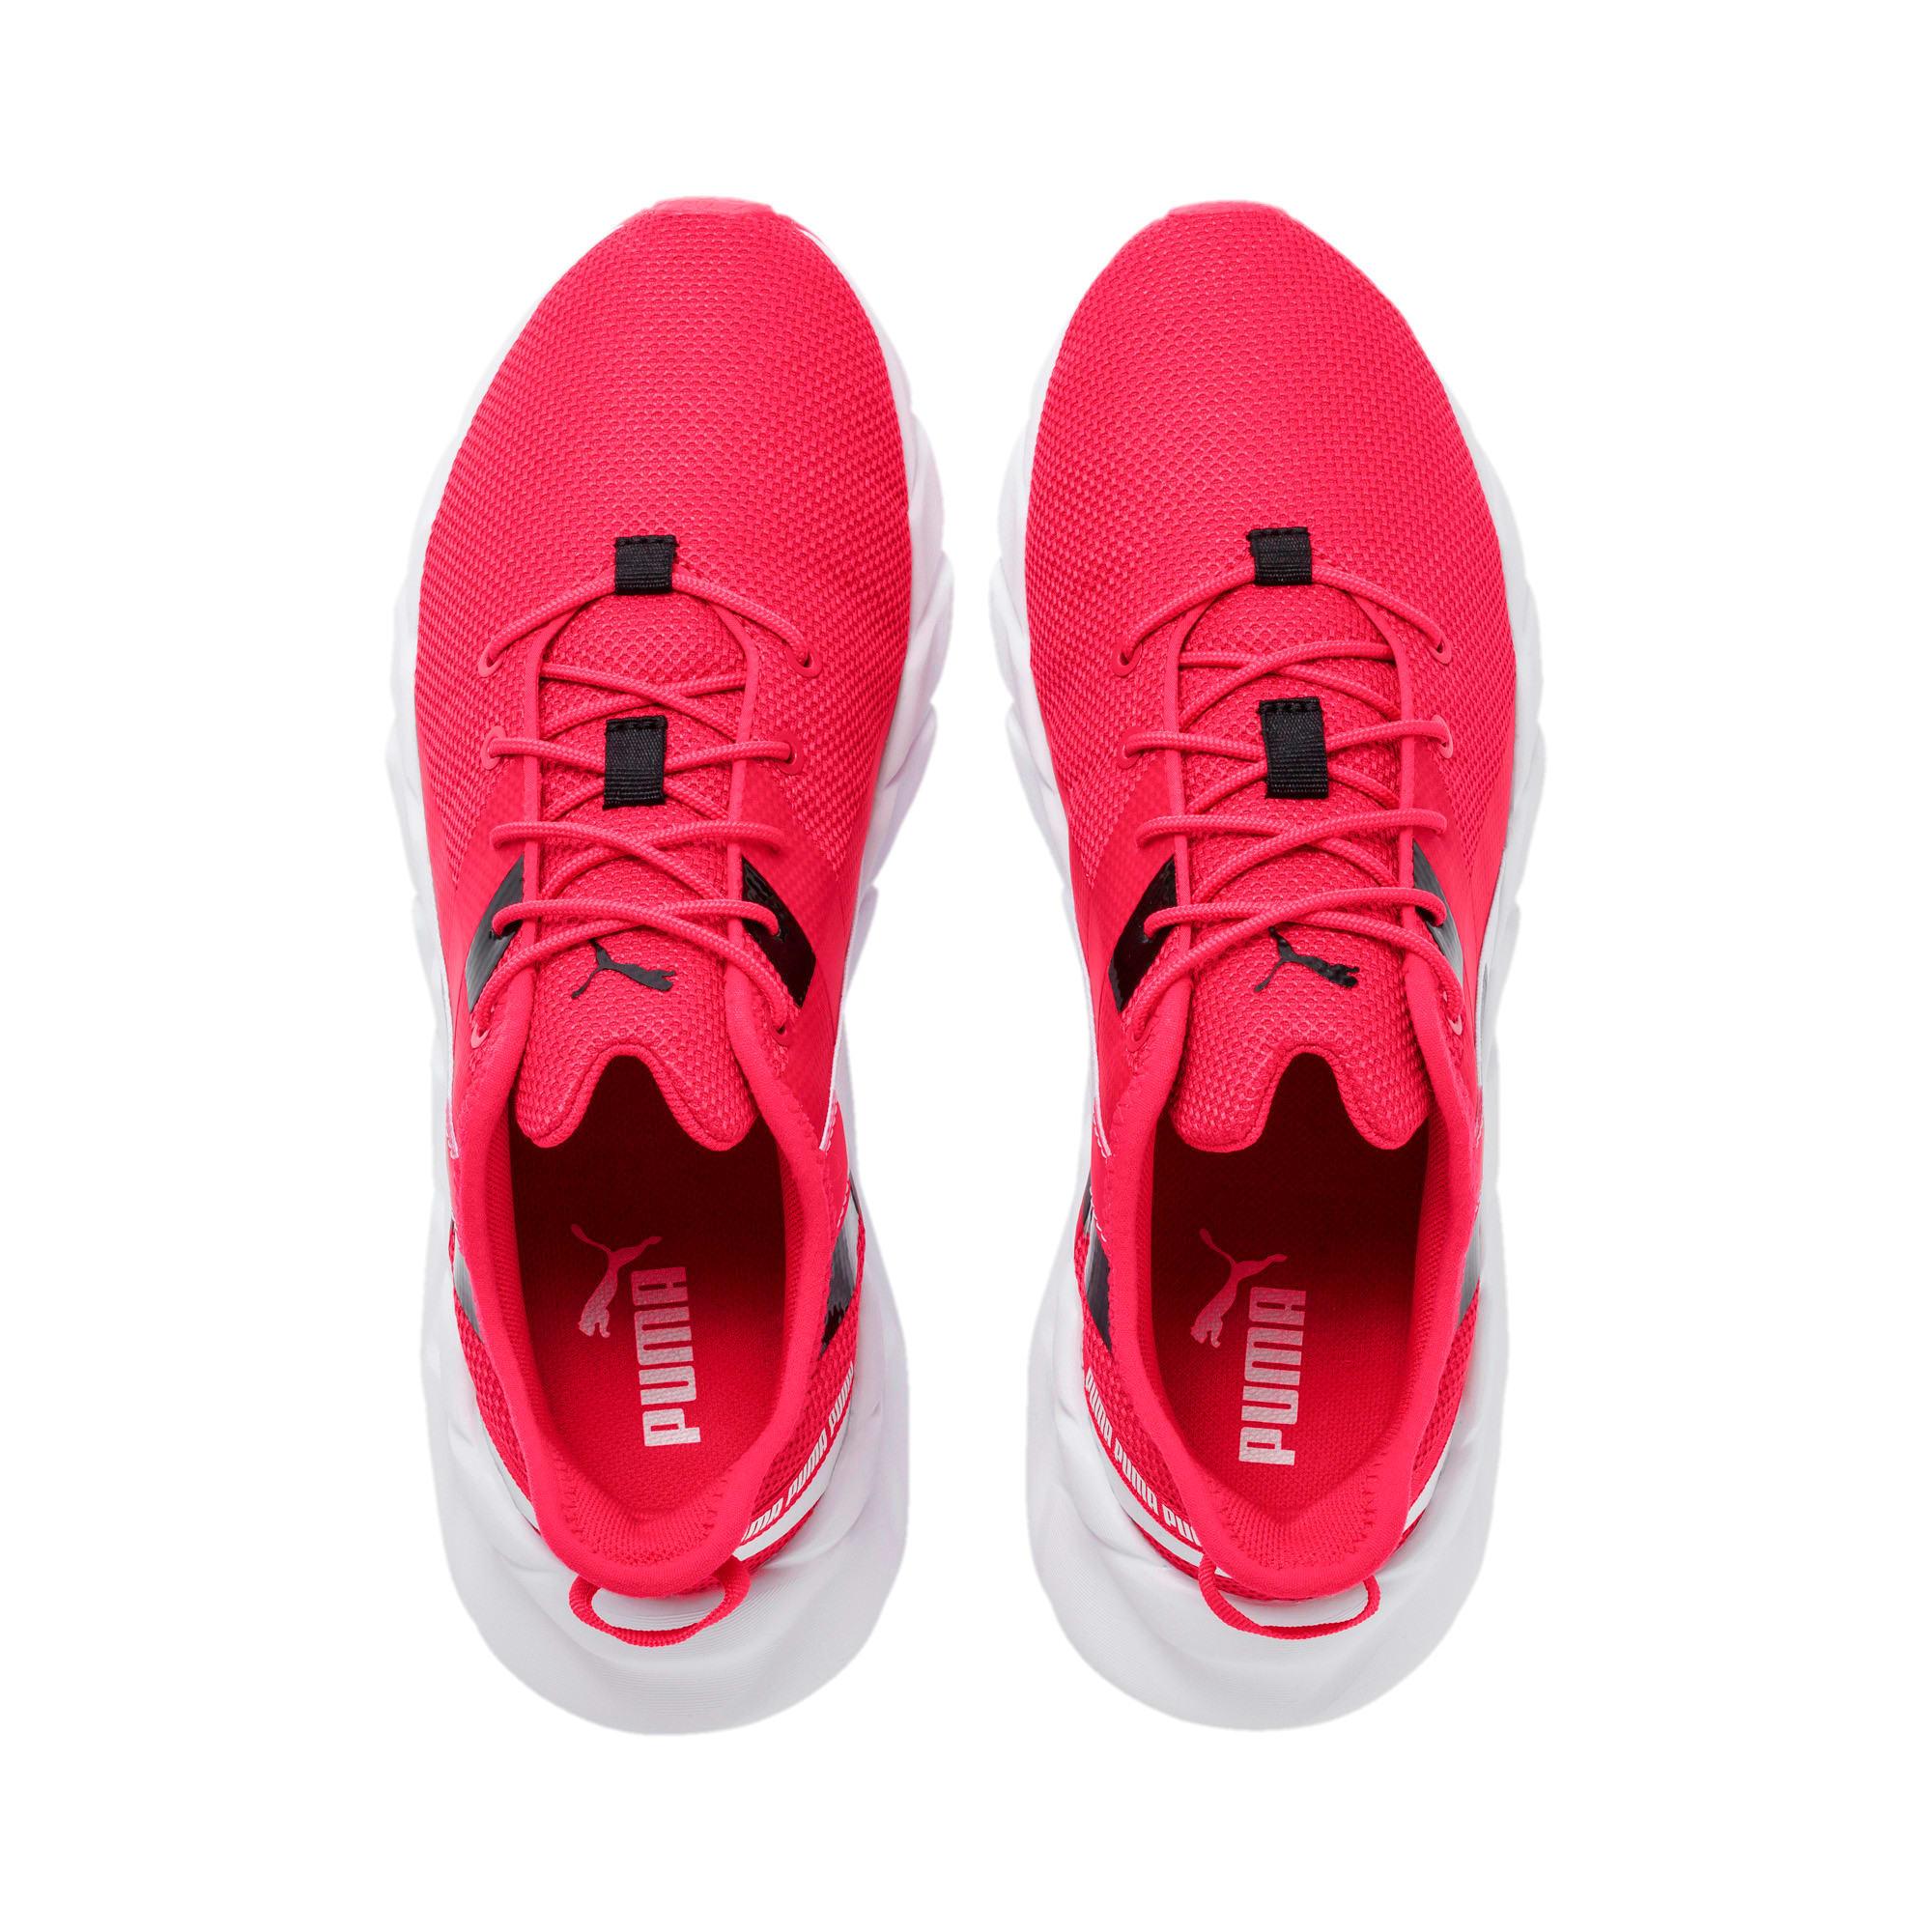 Thumbnail 8 of Weave XT Shift Women's Training Shoes, Nrgy Rose-Puma White, medium